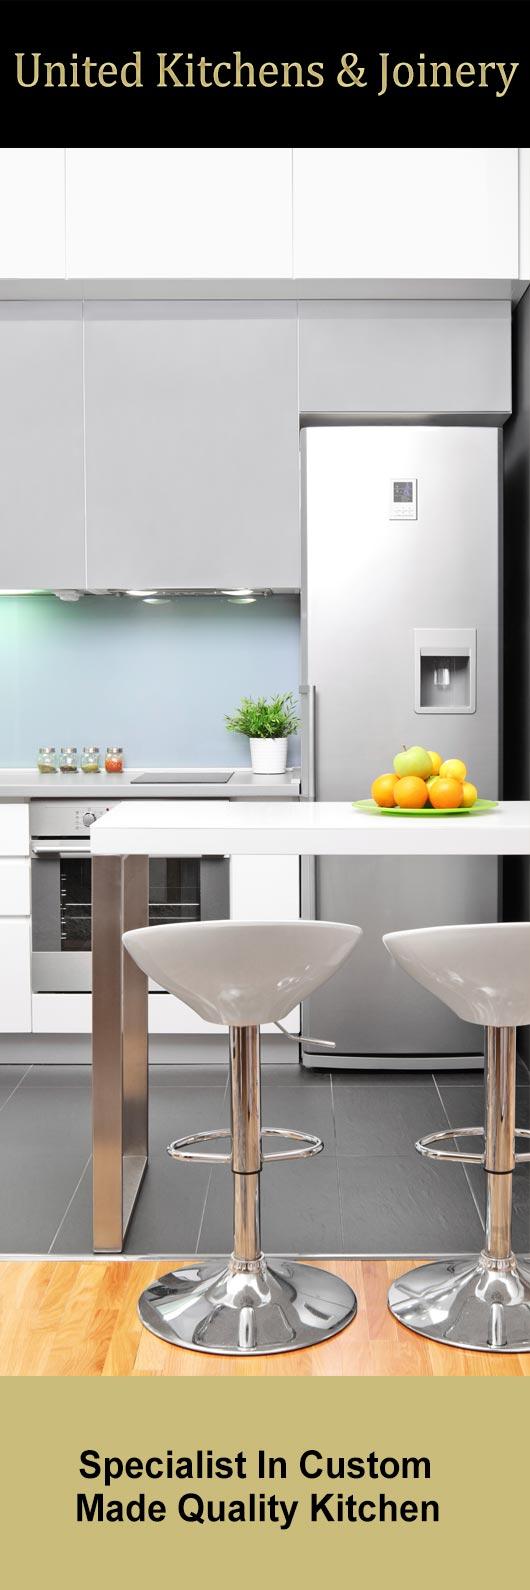 United Kitchens & Joinery - Kitchen Renovations & Designs - No- 3 ...